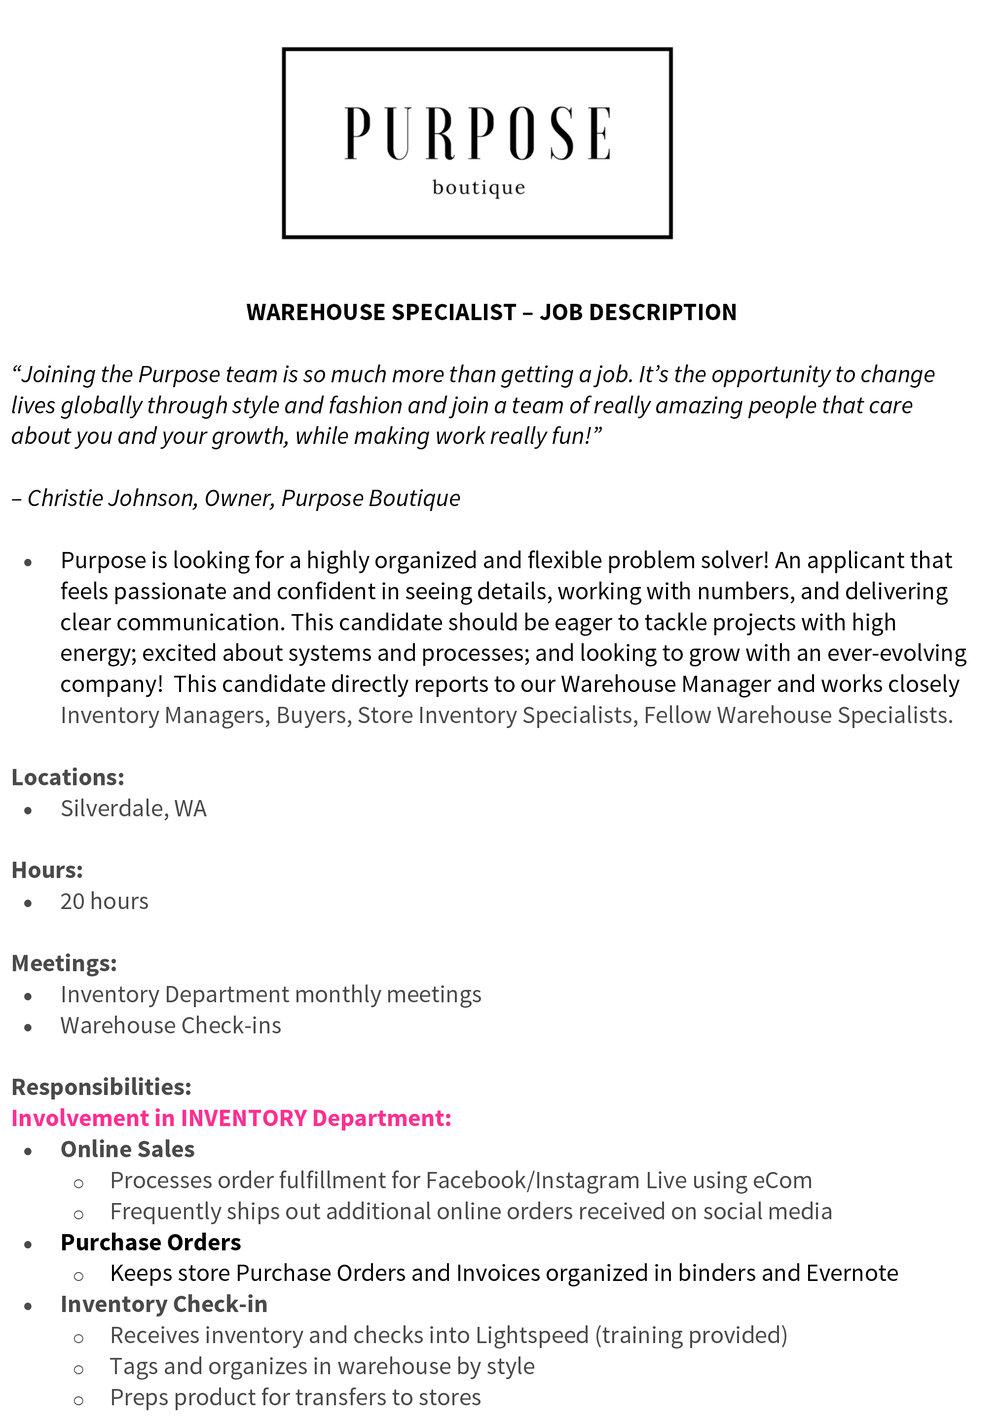 Warehouse Specialist - Job Description-1.jpg